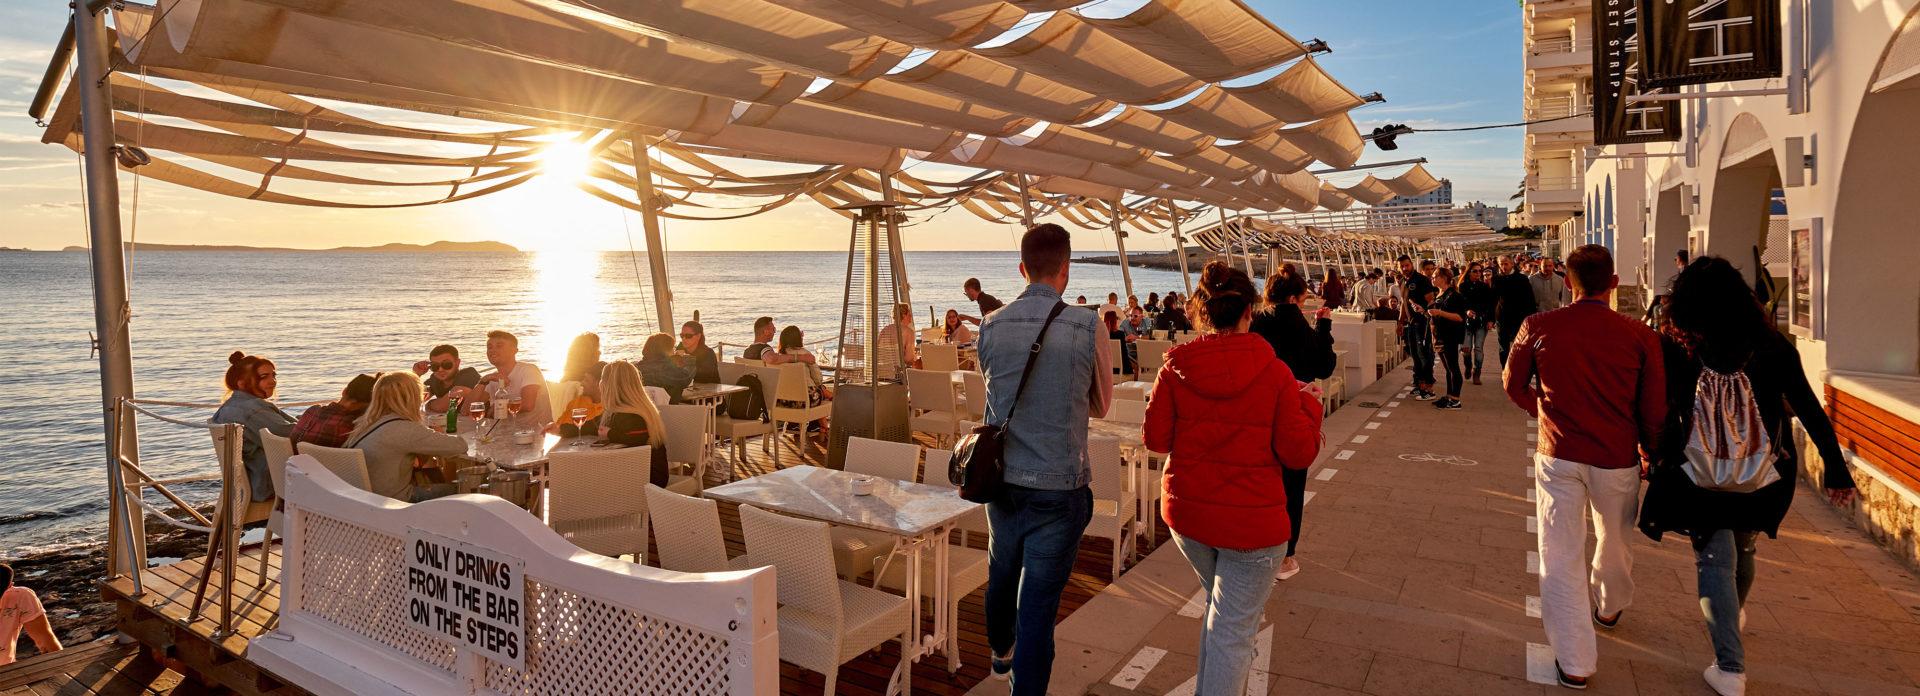 uteliv Spania Ibiza bargate utesteder barer